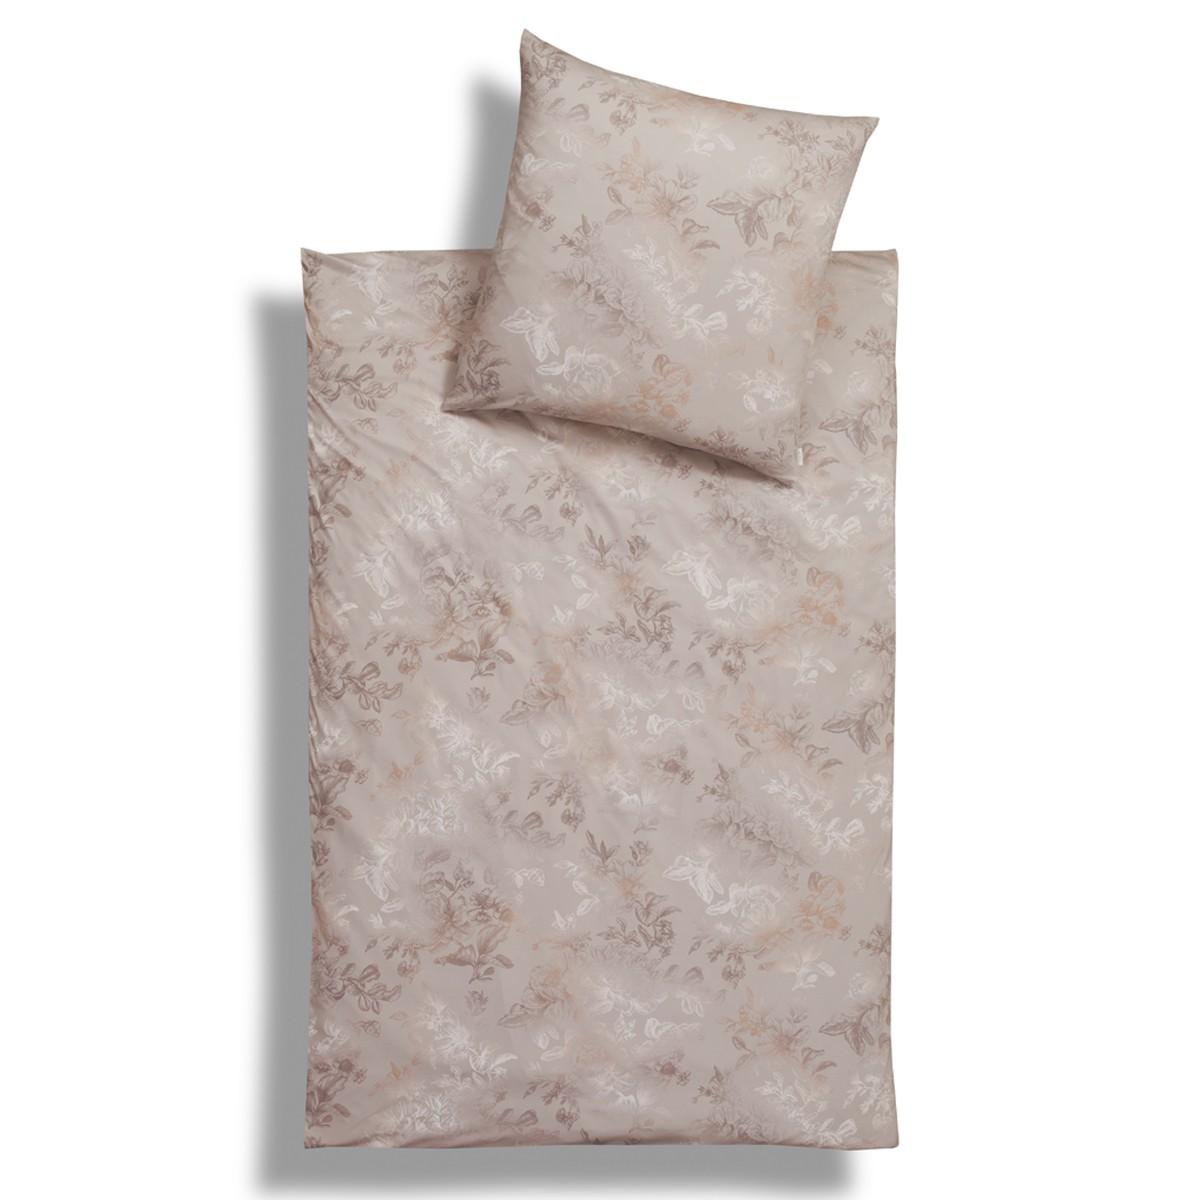 estella interlock jersey bettw sche freda bahama. Black Bedroom Furniture Sets. Home Design Ideas